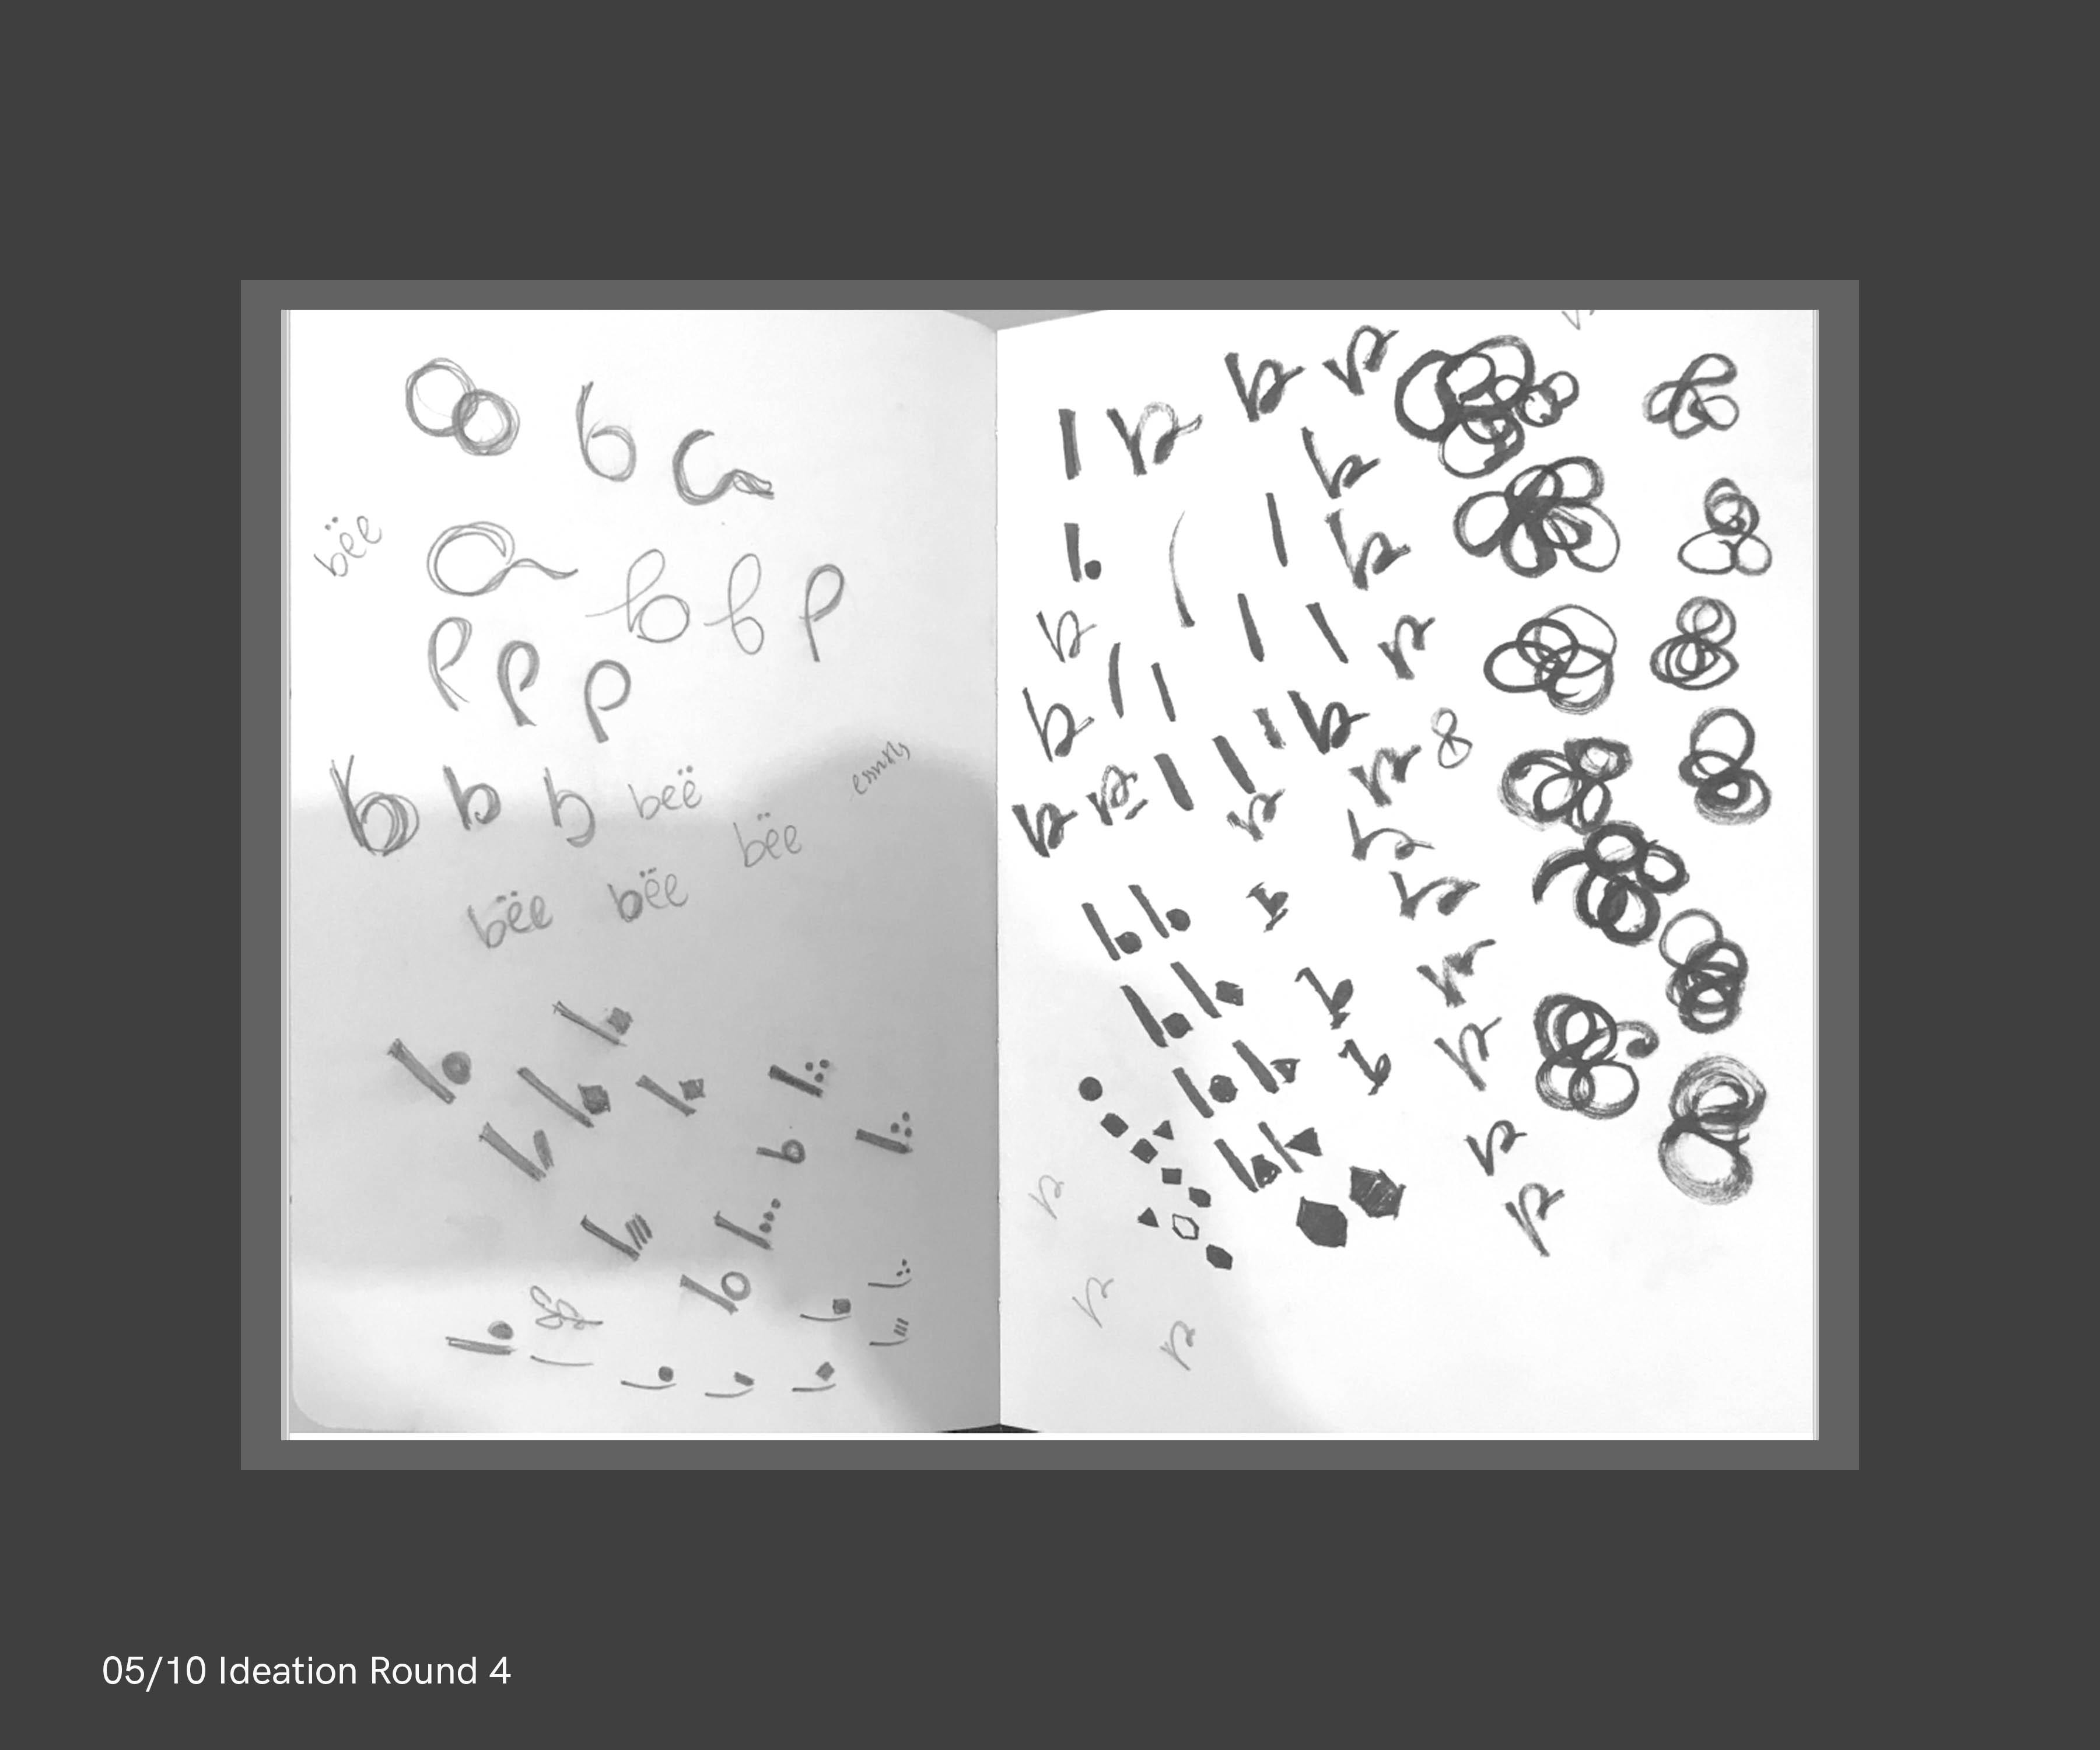 b_process_logo1_sketches-5.1